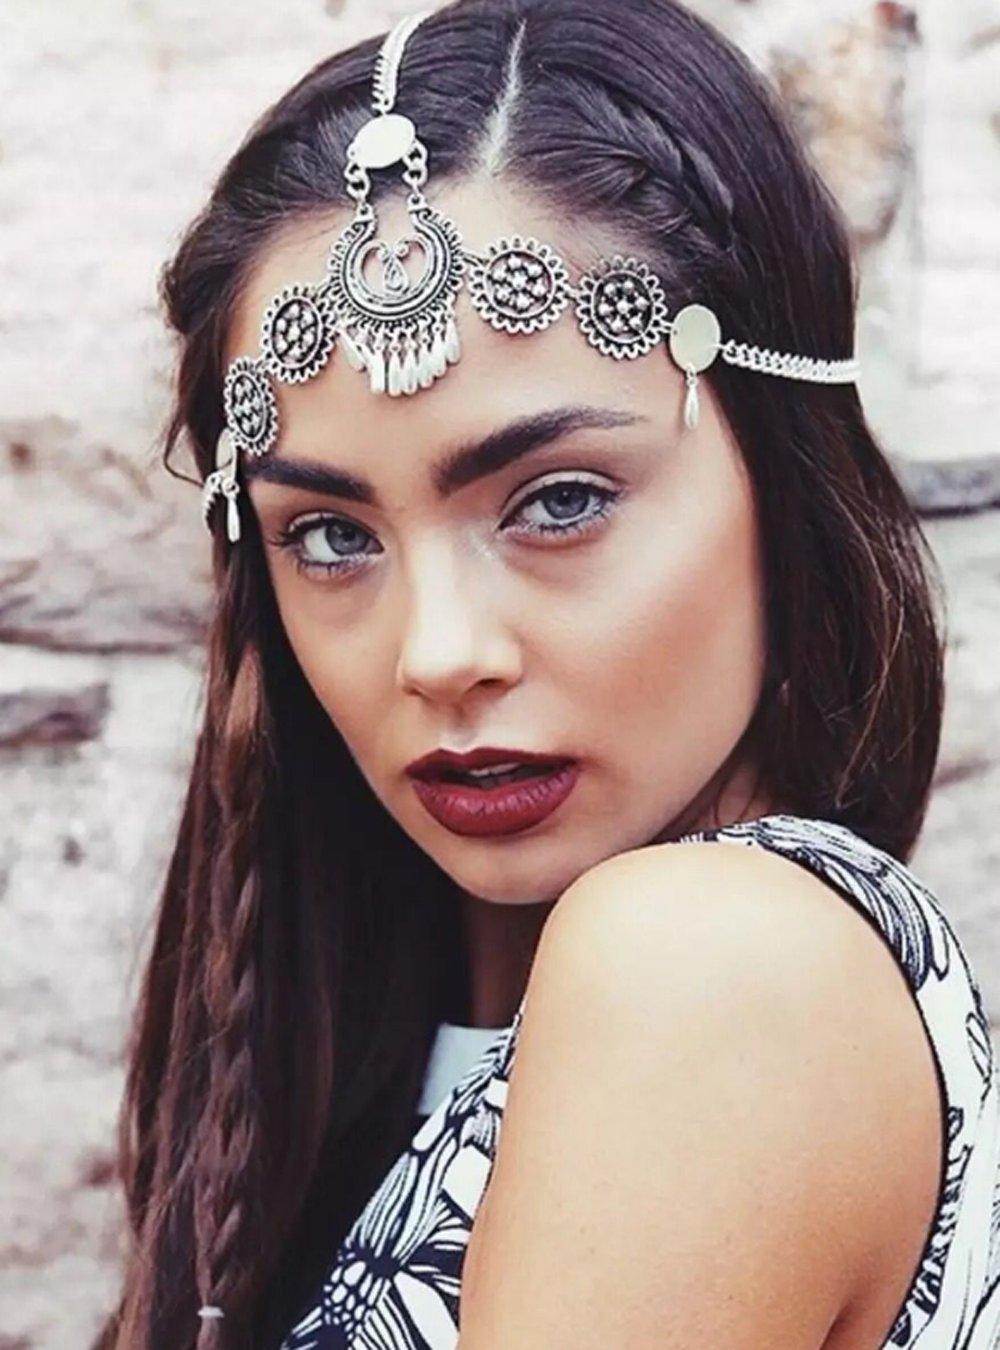 Denifery Bridal Boho Silver Head Chain Bridal Headpiece Bohemian Wedding Hair Accessories